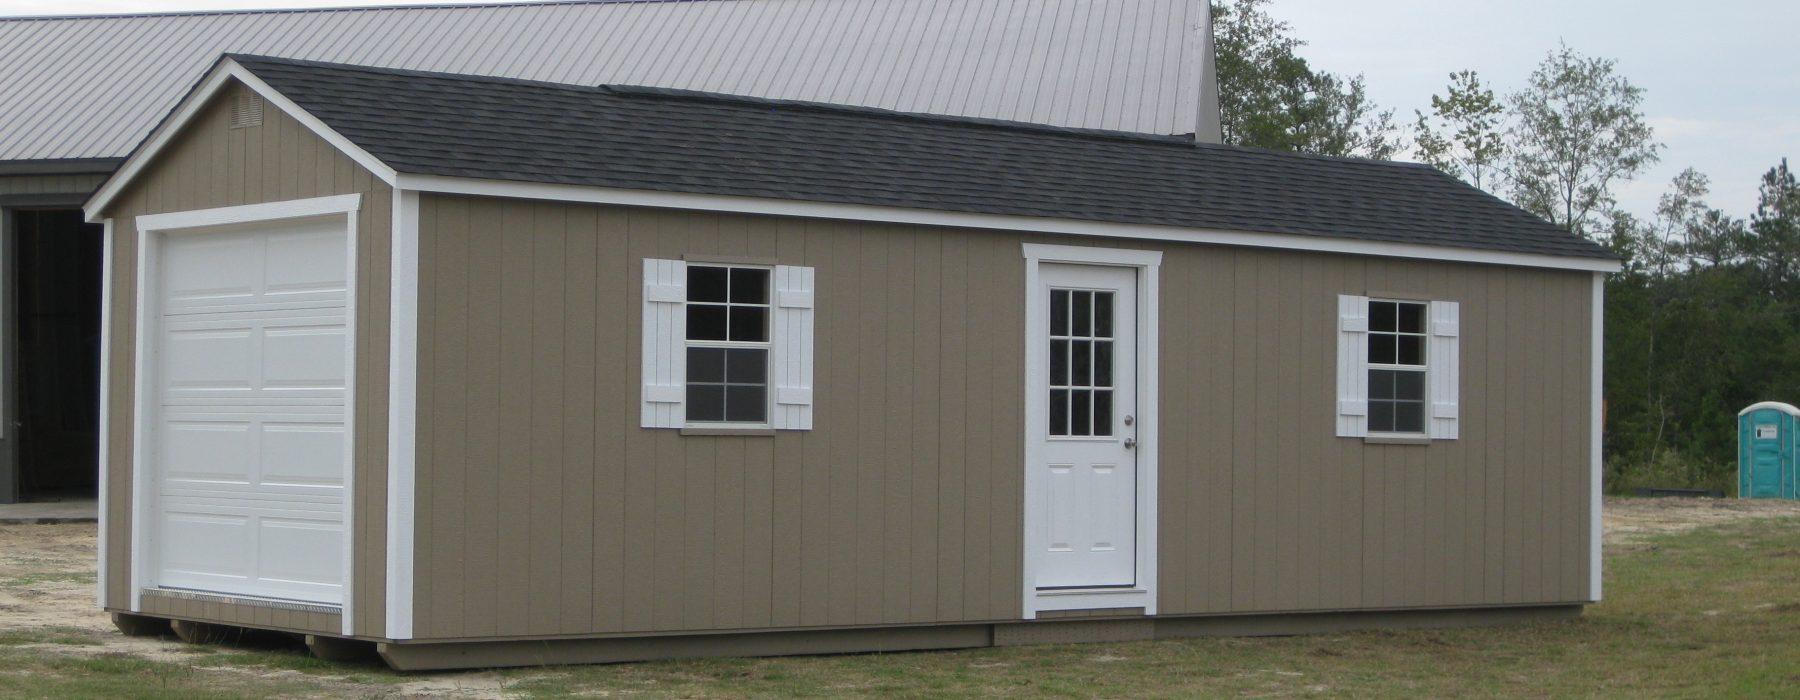 garage sheds garage 2